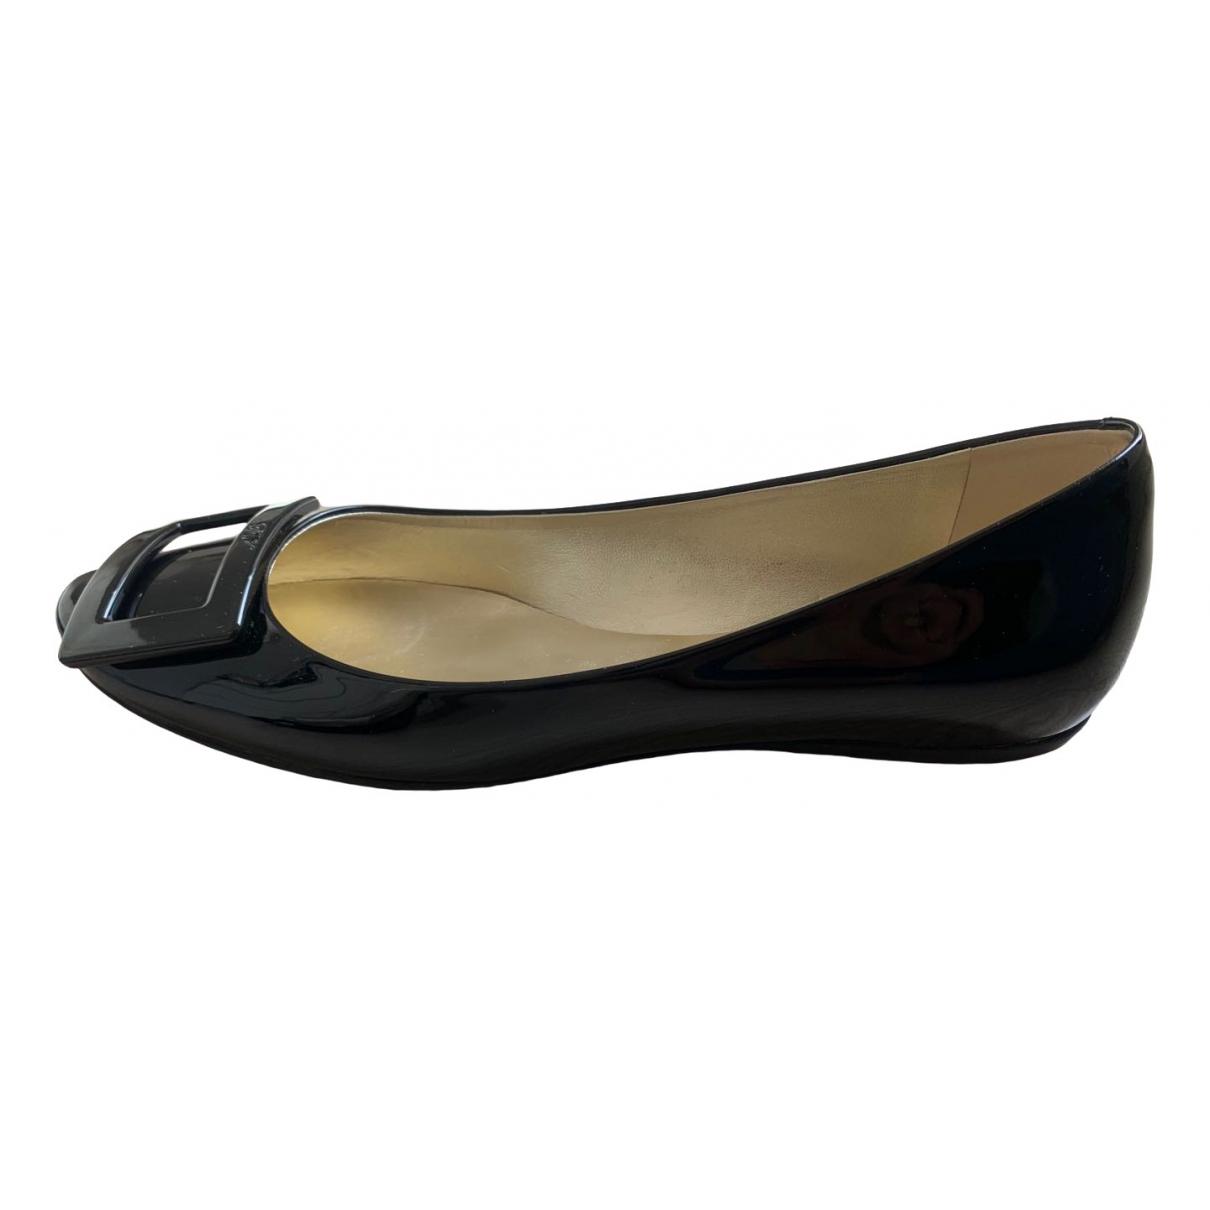 Roger Vivier Gommetine Black Patent leather Ballet flats for Women 38 EU